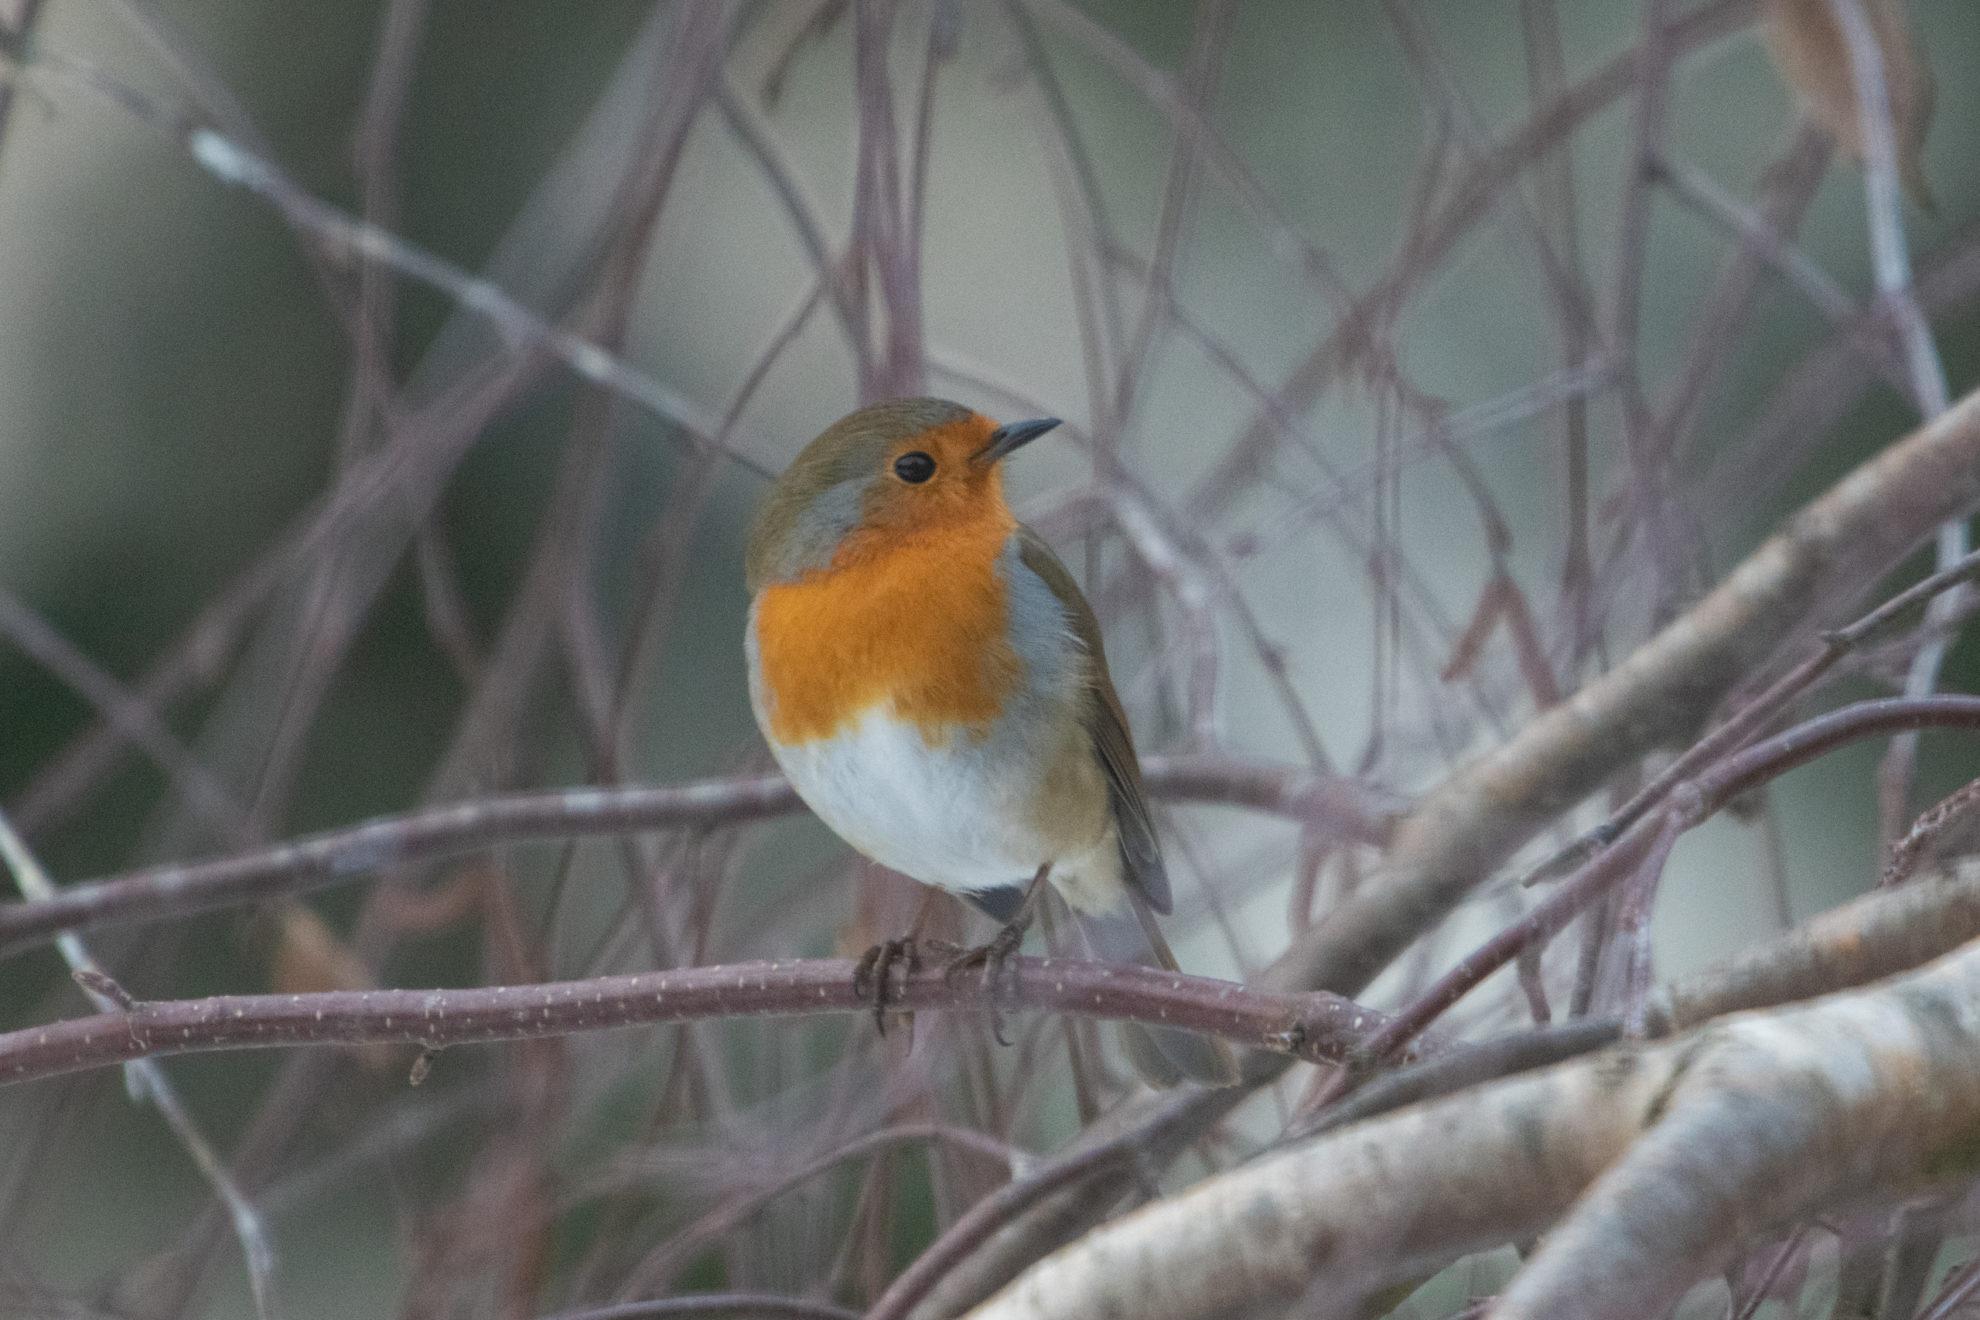 Rouge-gorge European robin